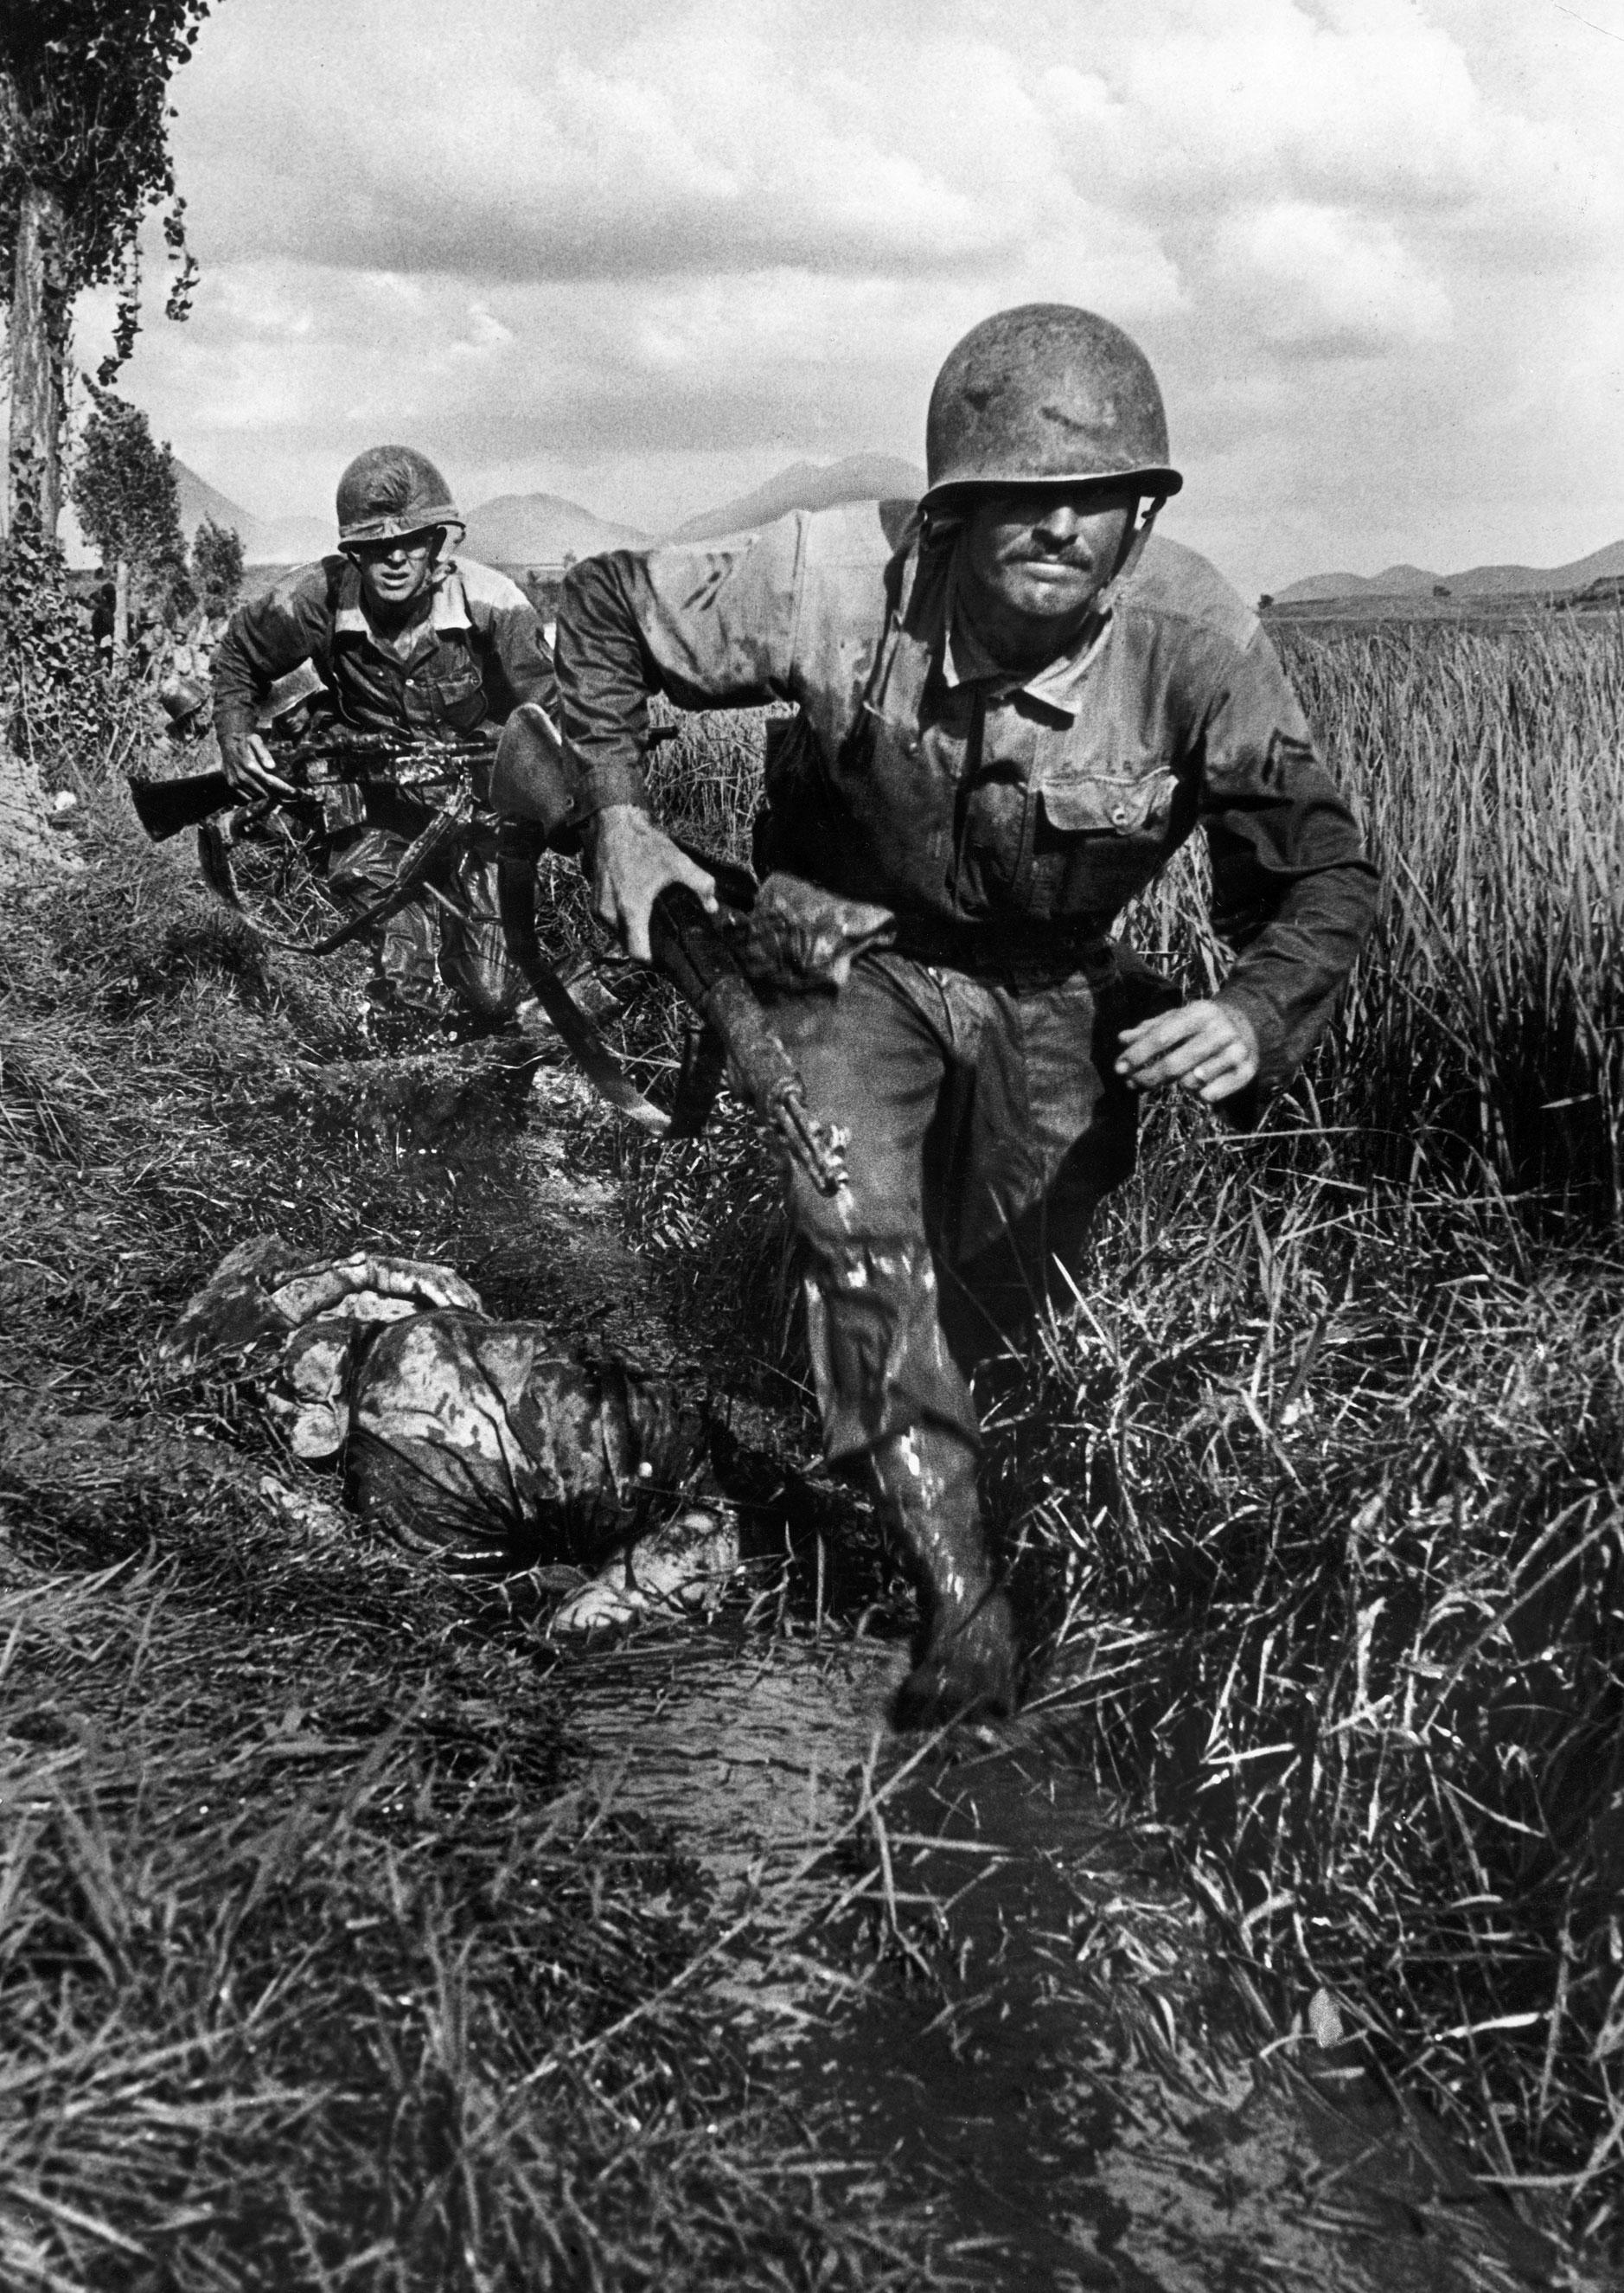 American Marines race past a dead enemy soldier in Korea, September 1950.